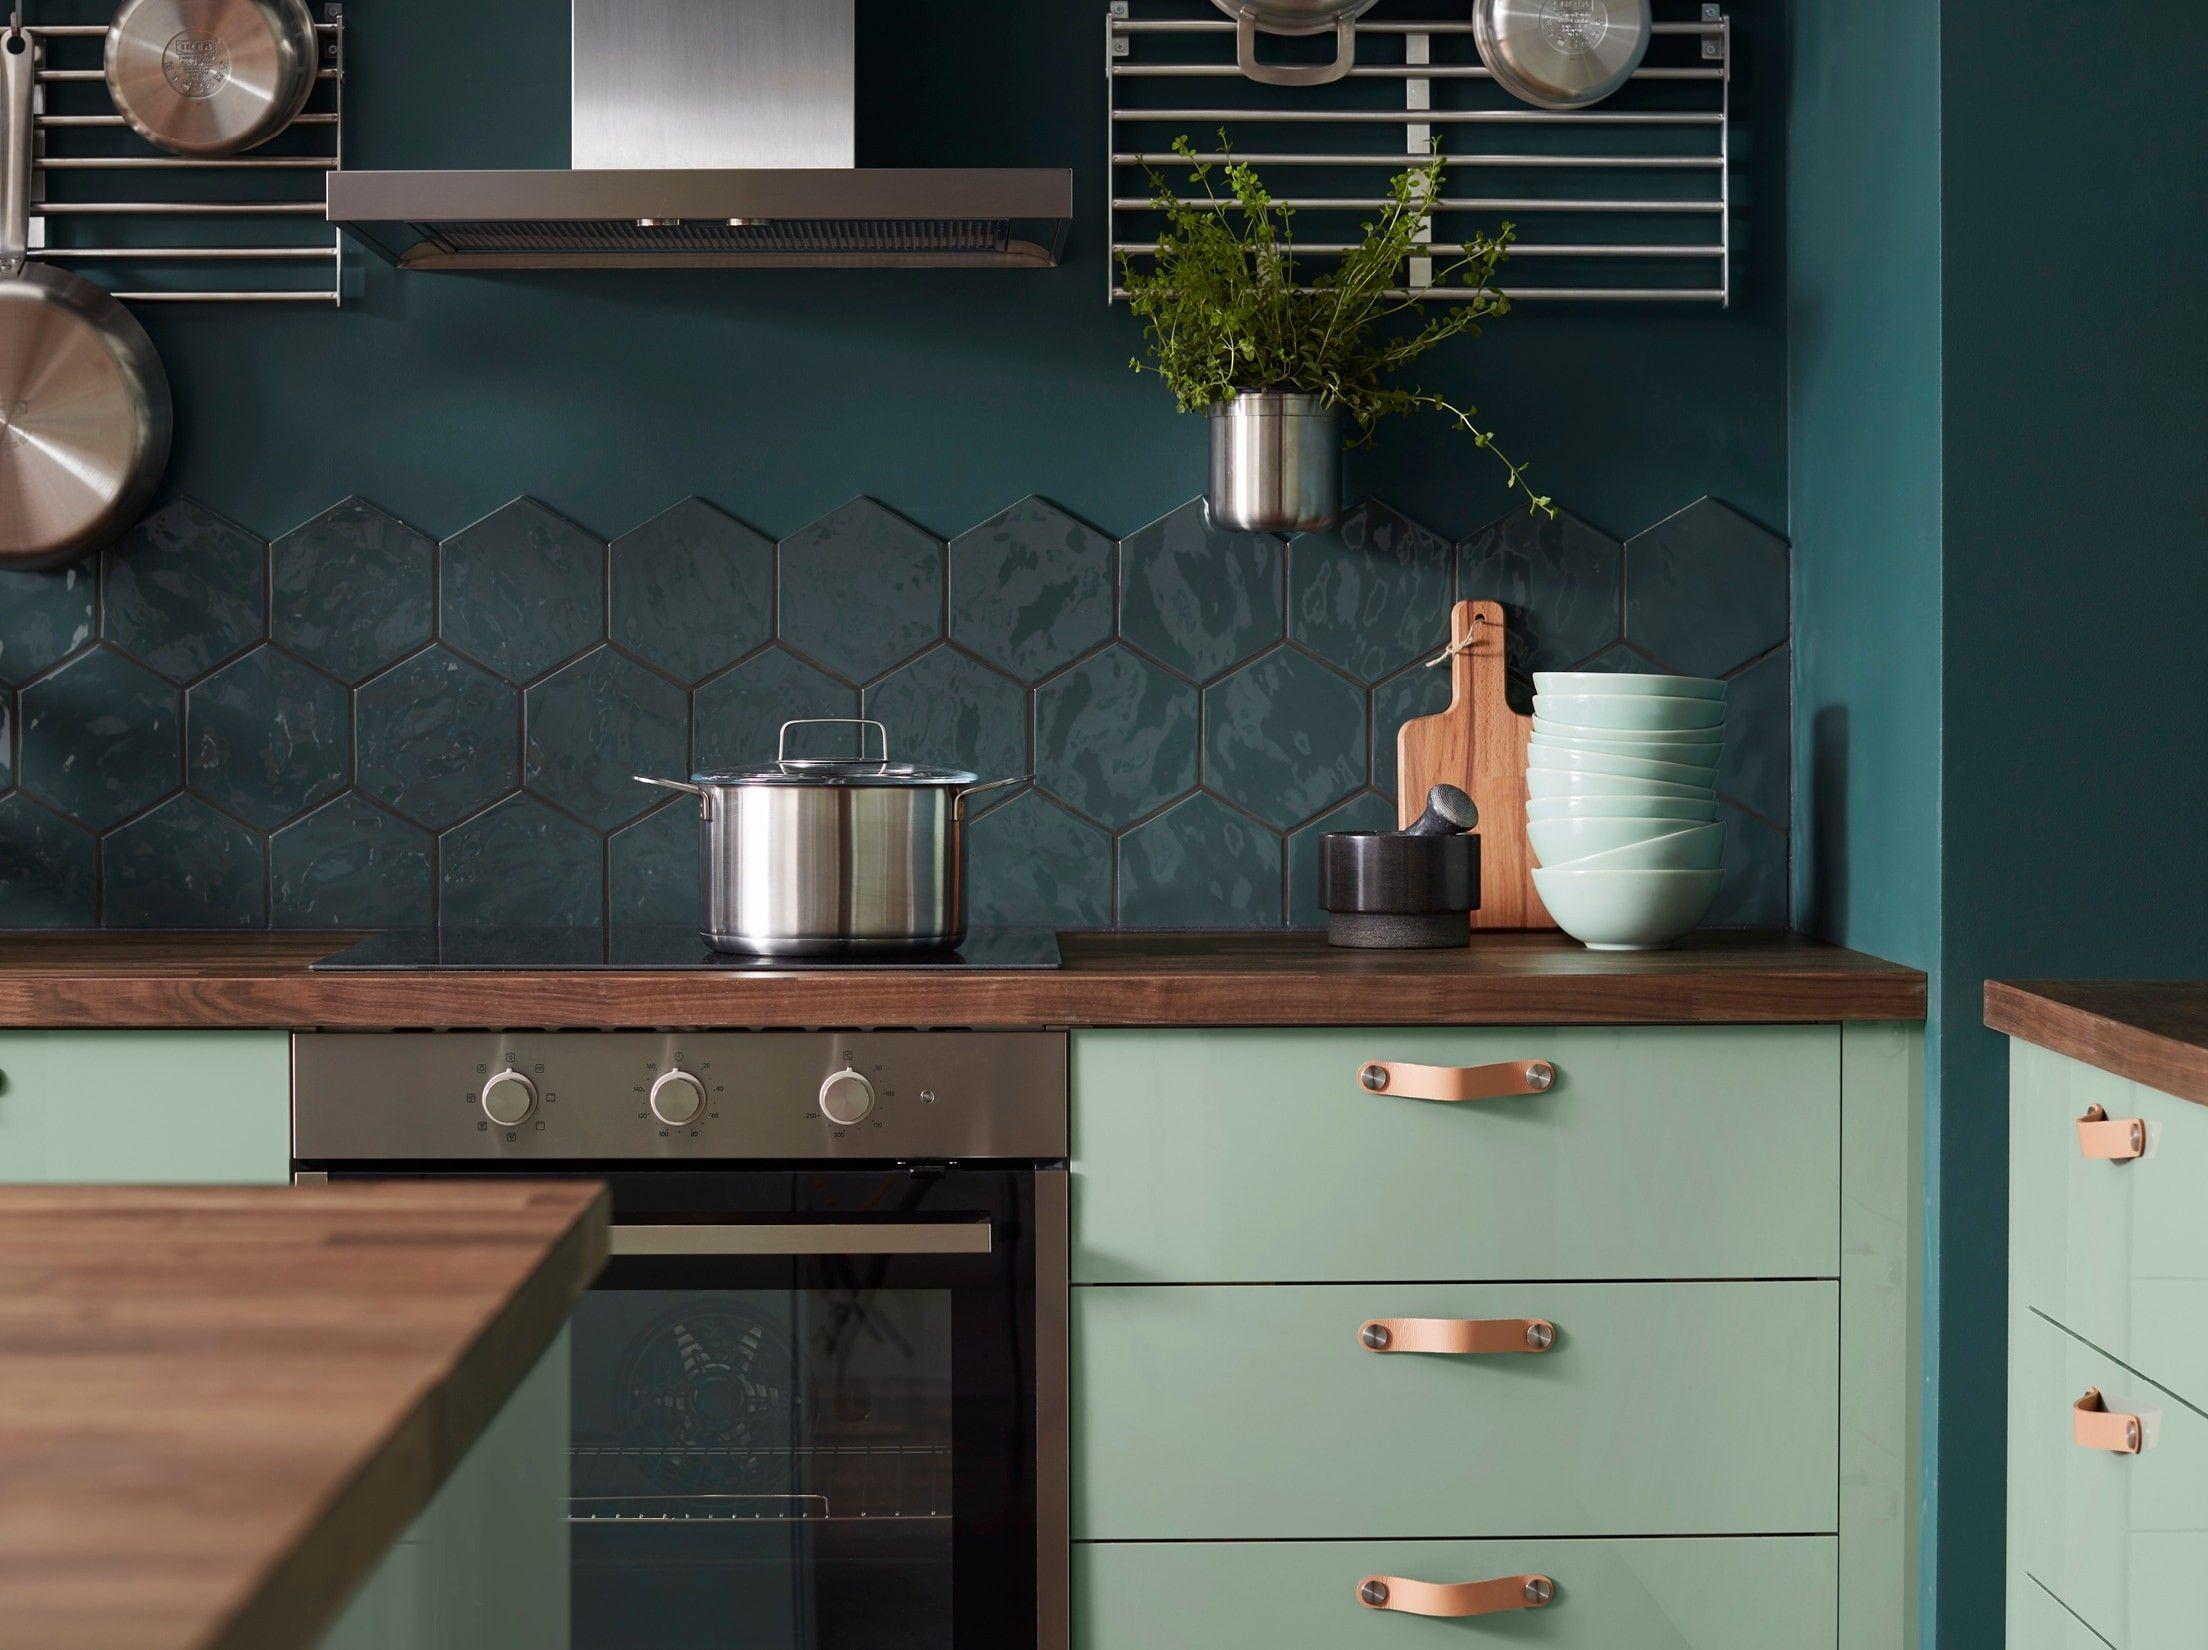 99 Inspirational Inspiration Of Ikea's Kitchen Designs